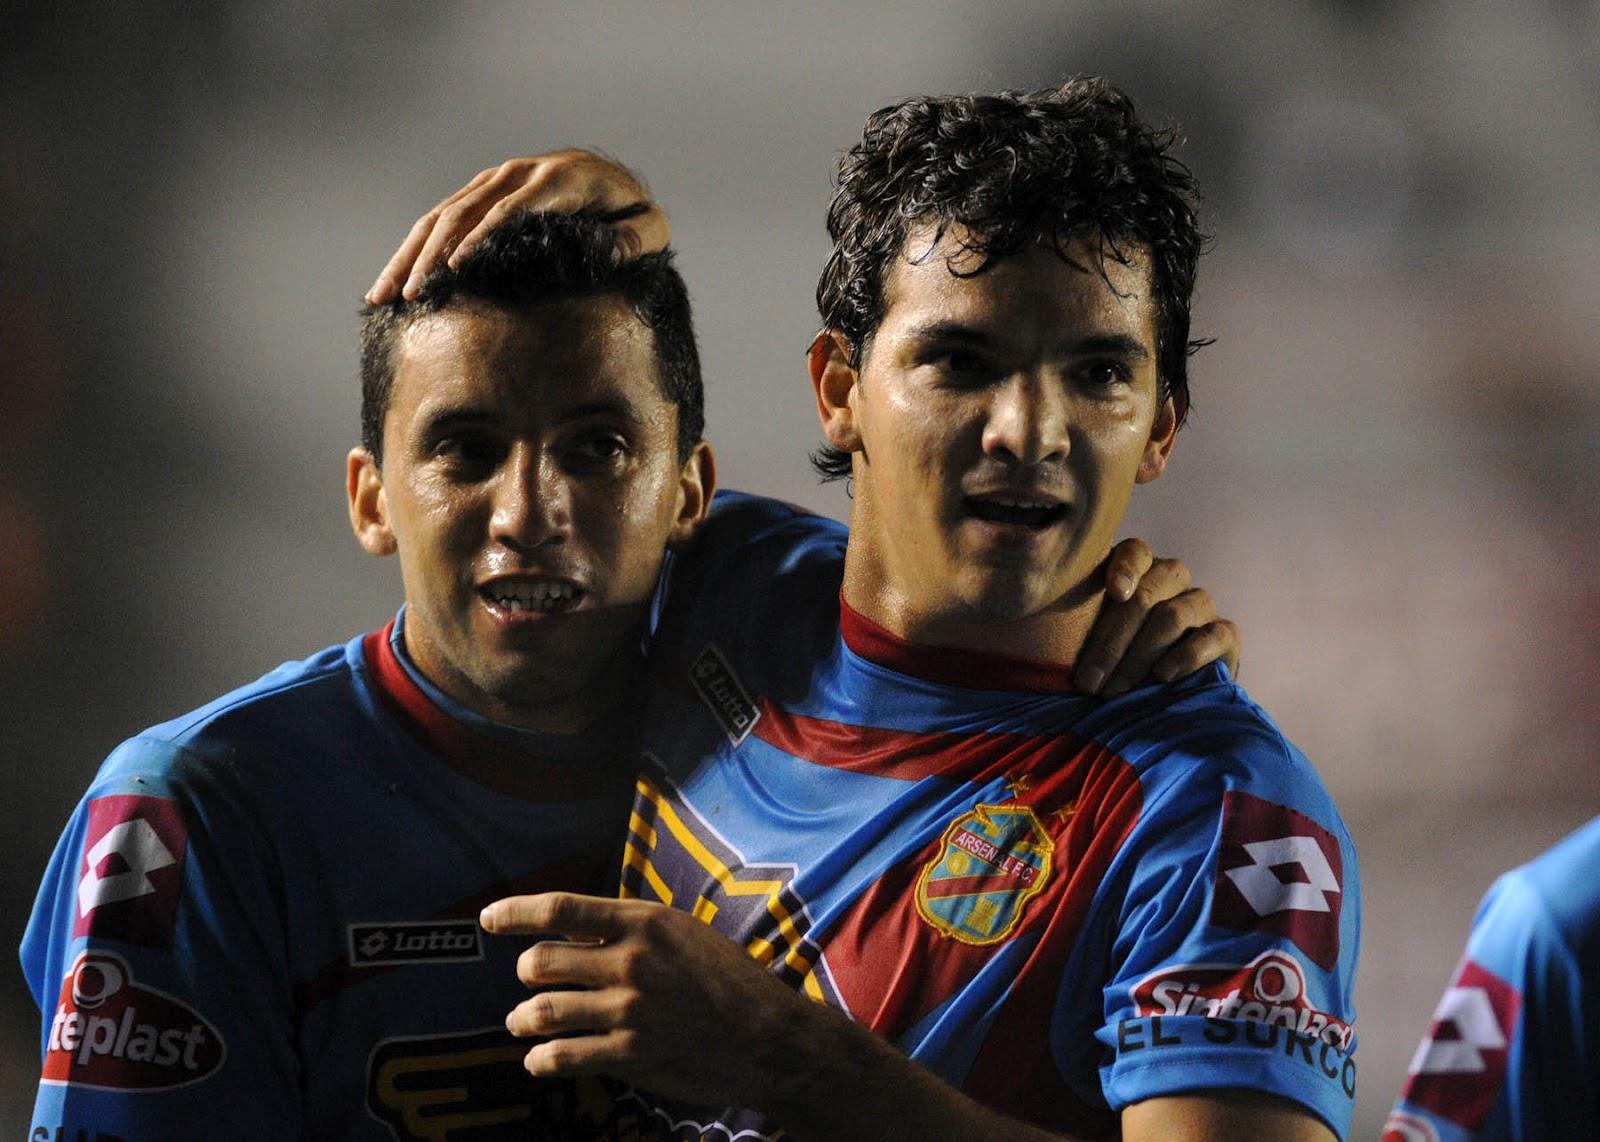 2012 Fechas Clausura 2012 Resumen Fecha